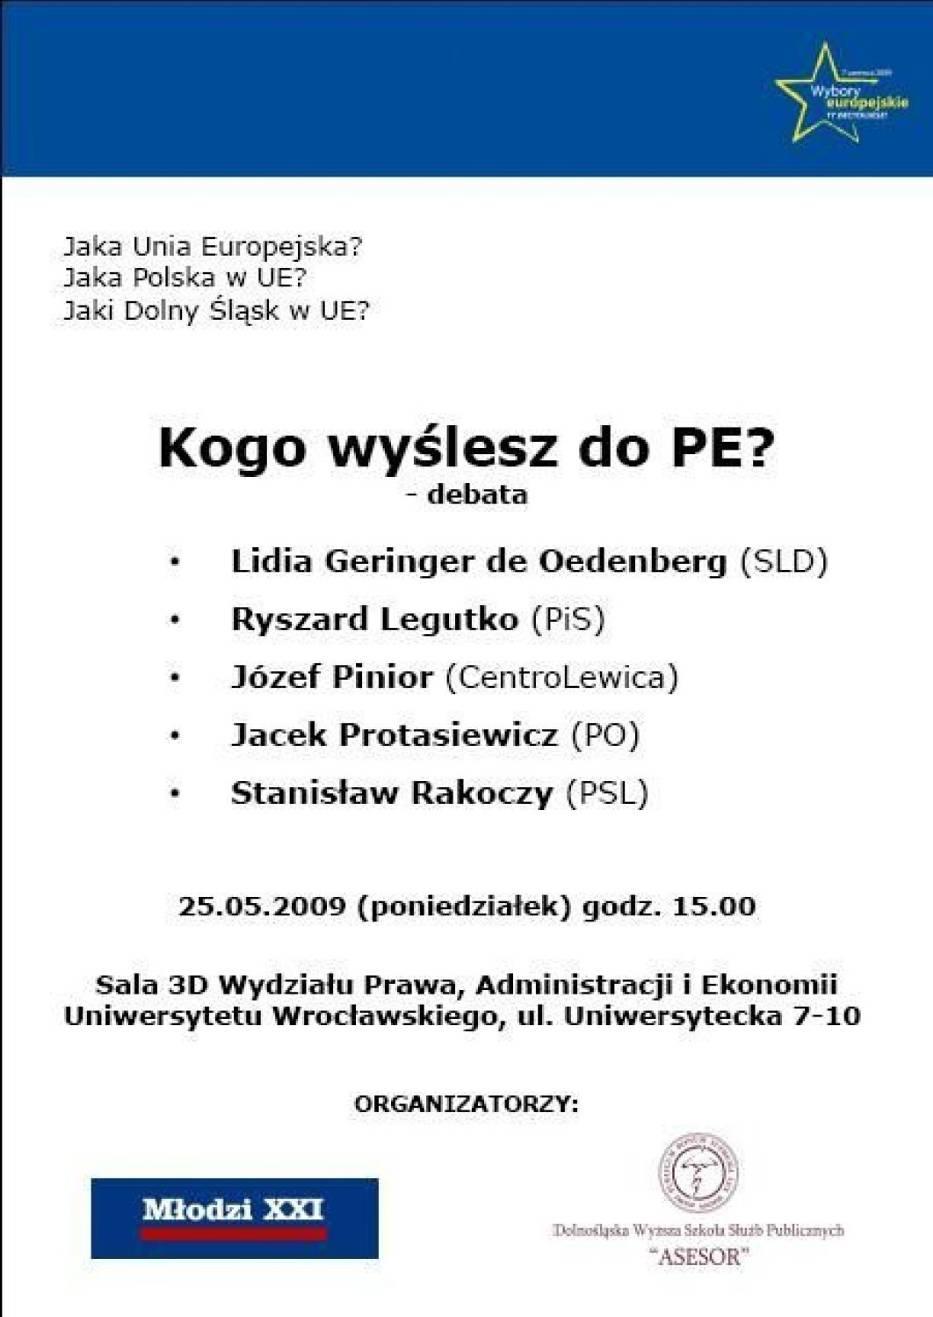 Plakat promujący debatę